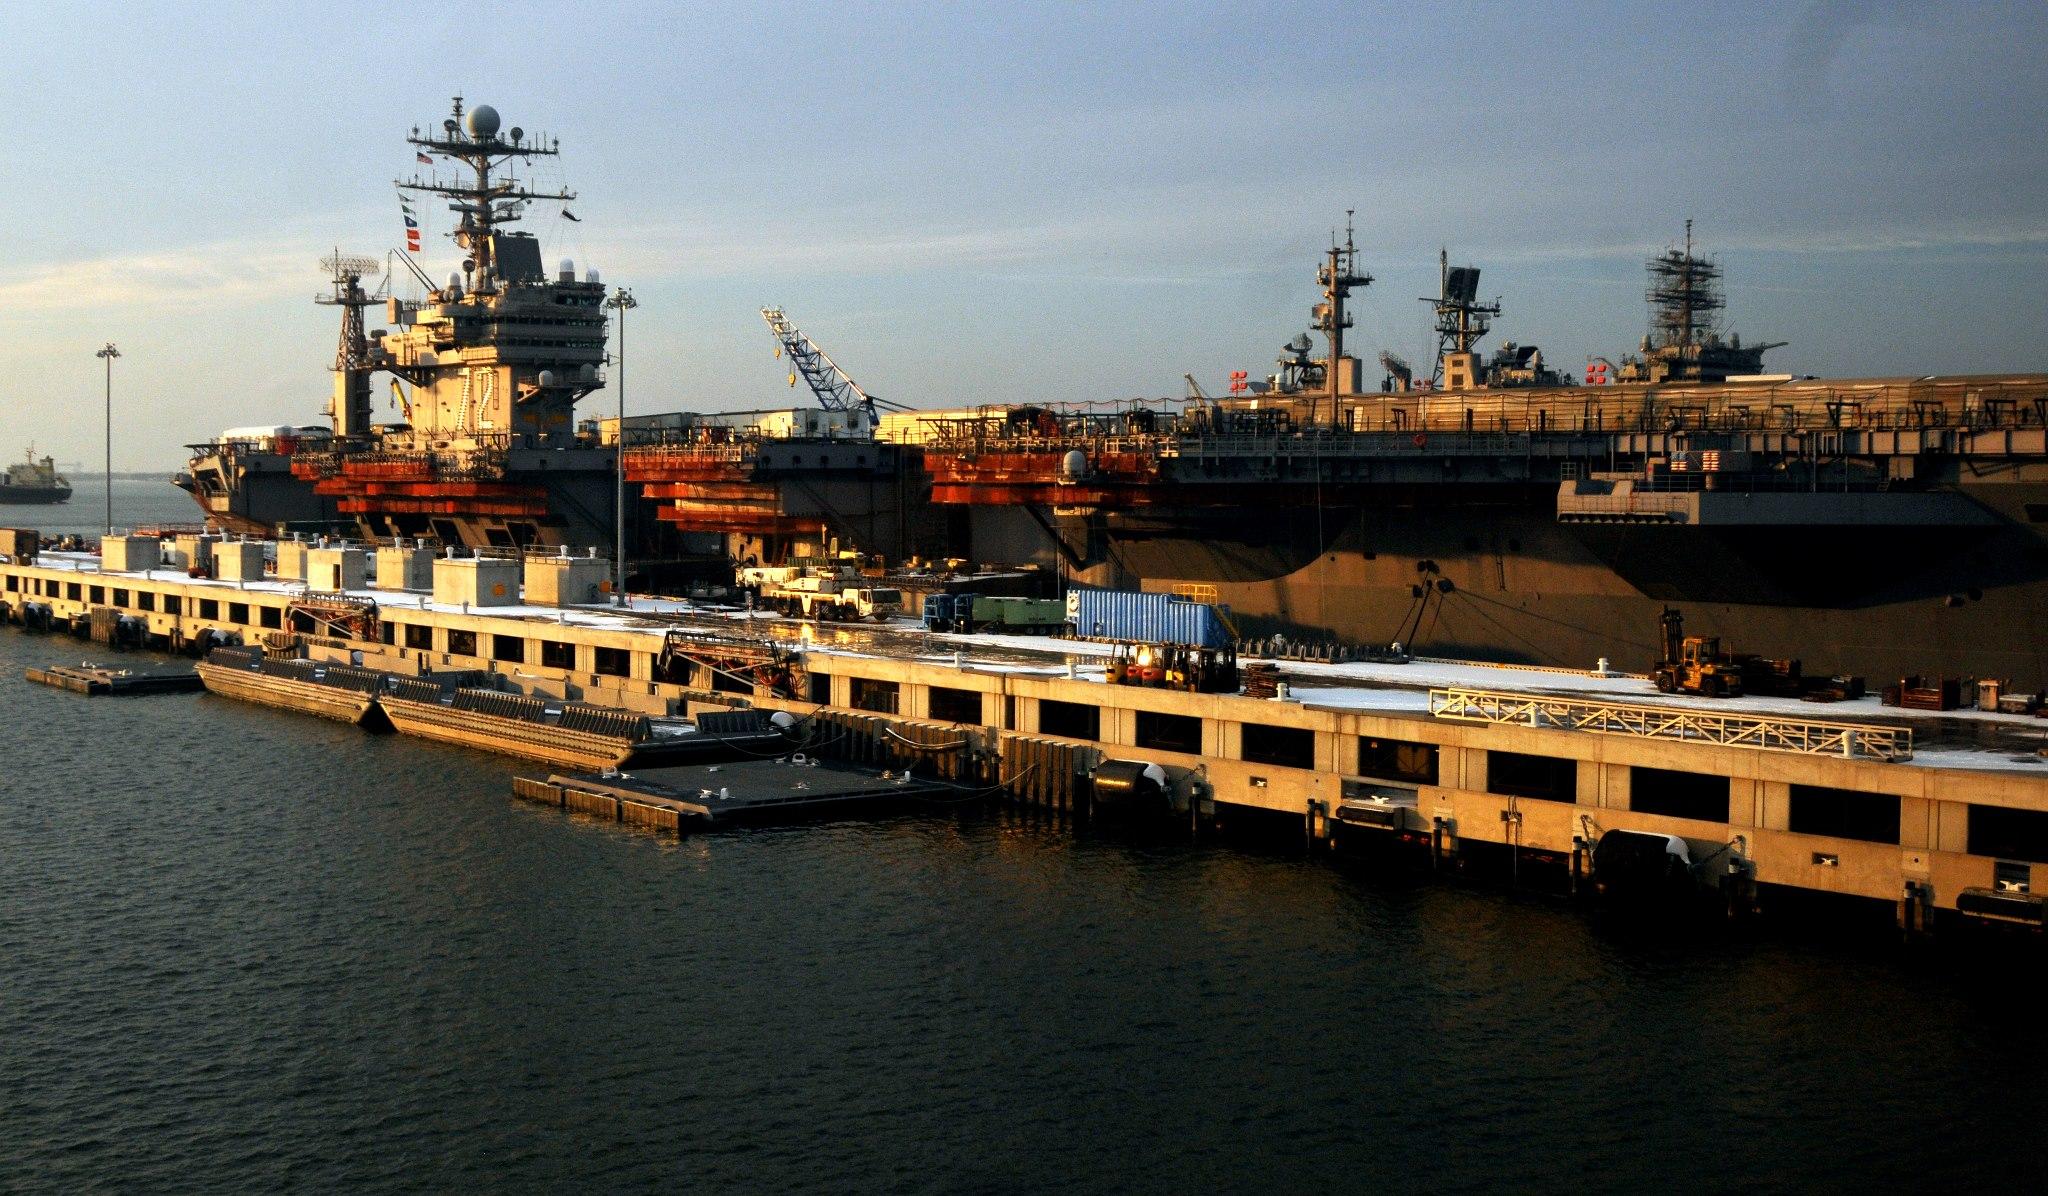 Bild: USS ABRAHAM LINCOLN Facebook page